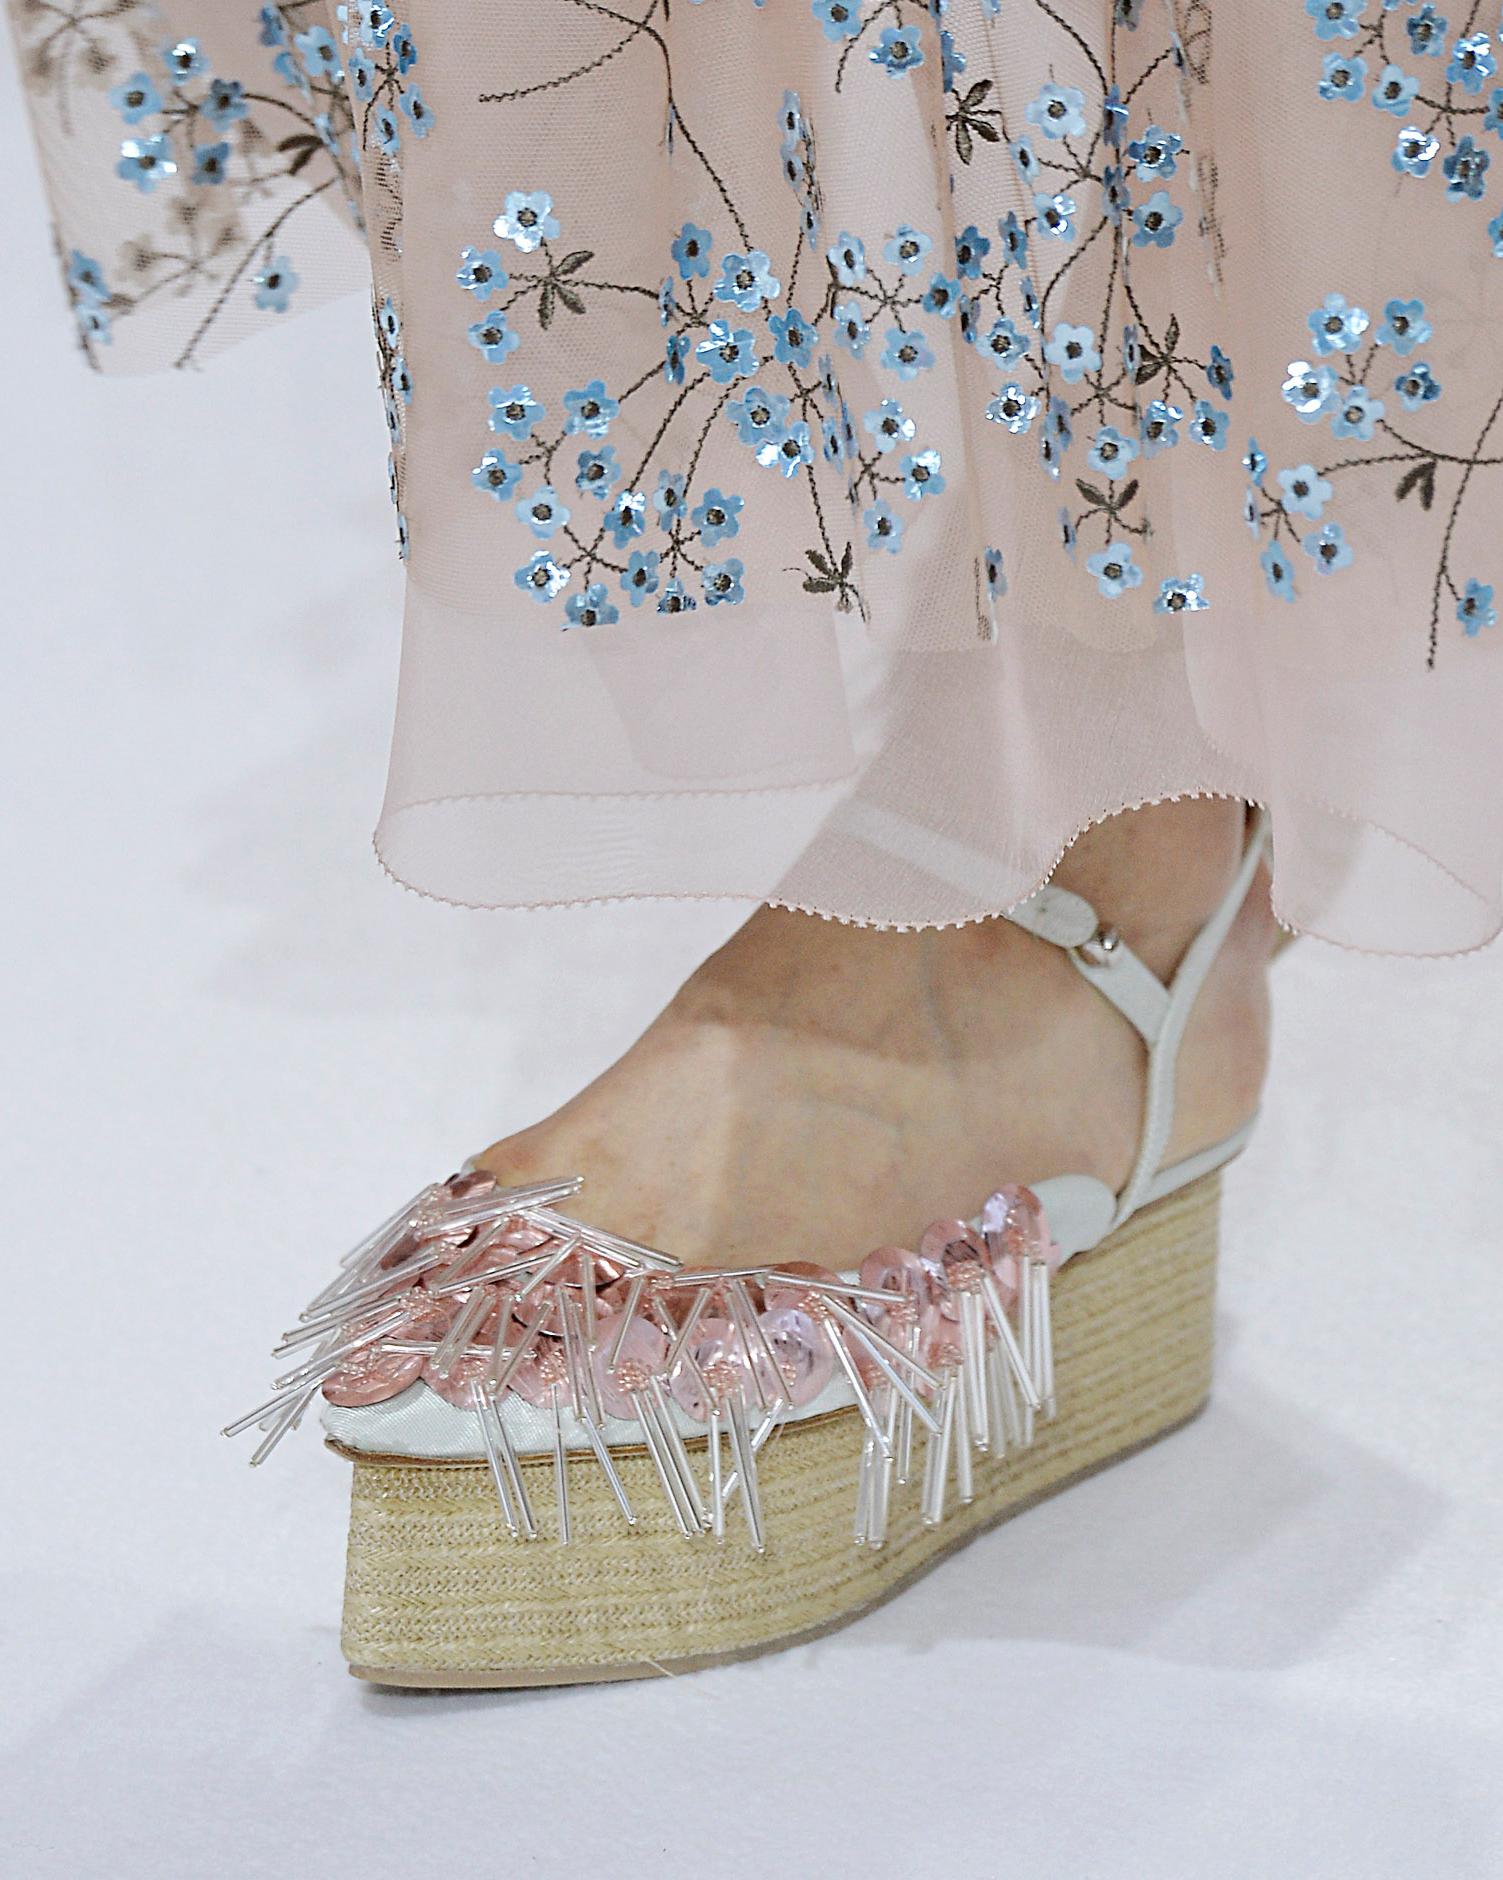 sp16-nyfw-bridal-accessories-delpozo-shoes-0915.jpg